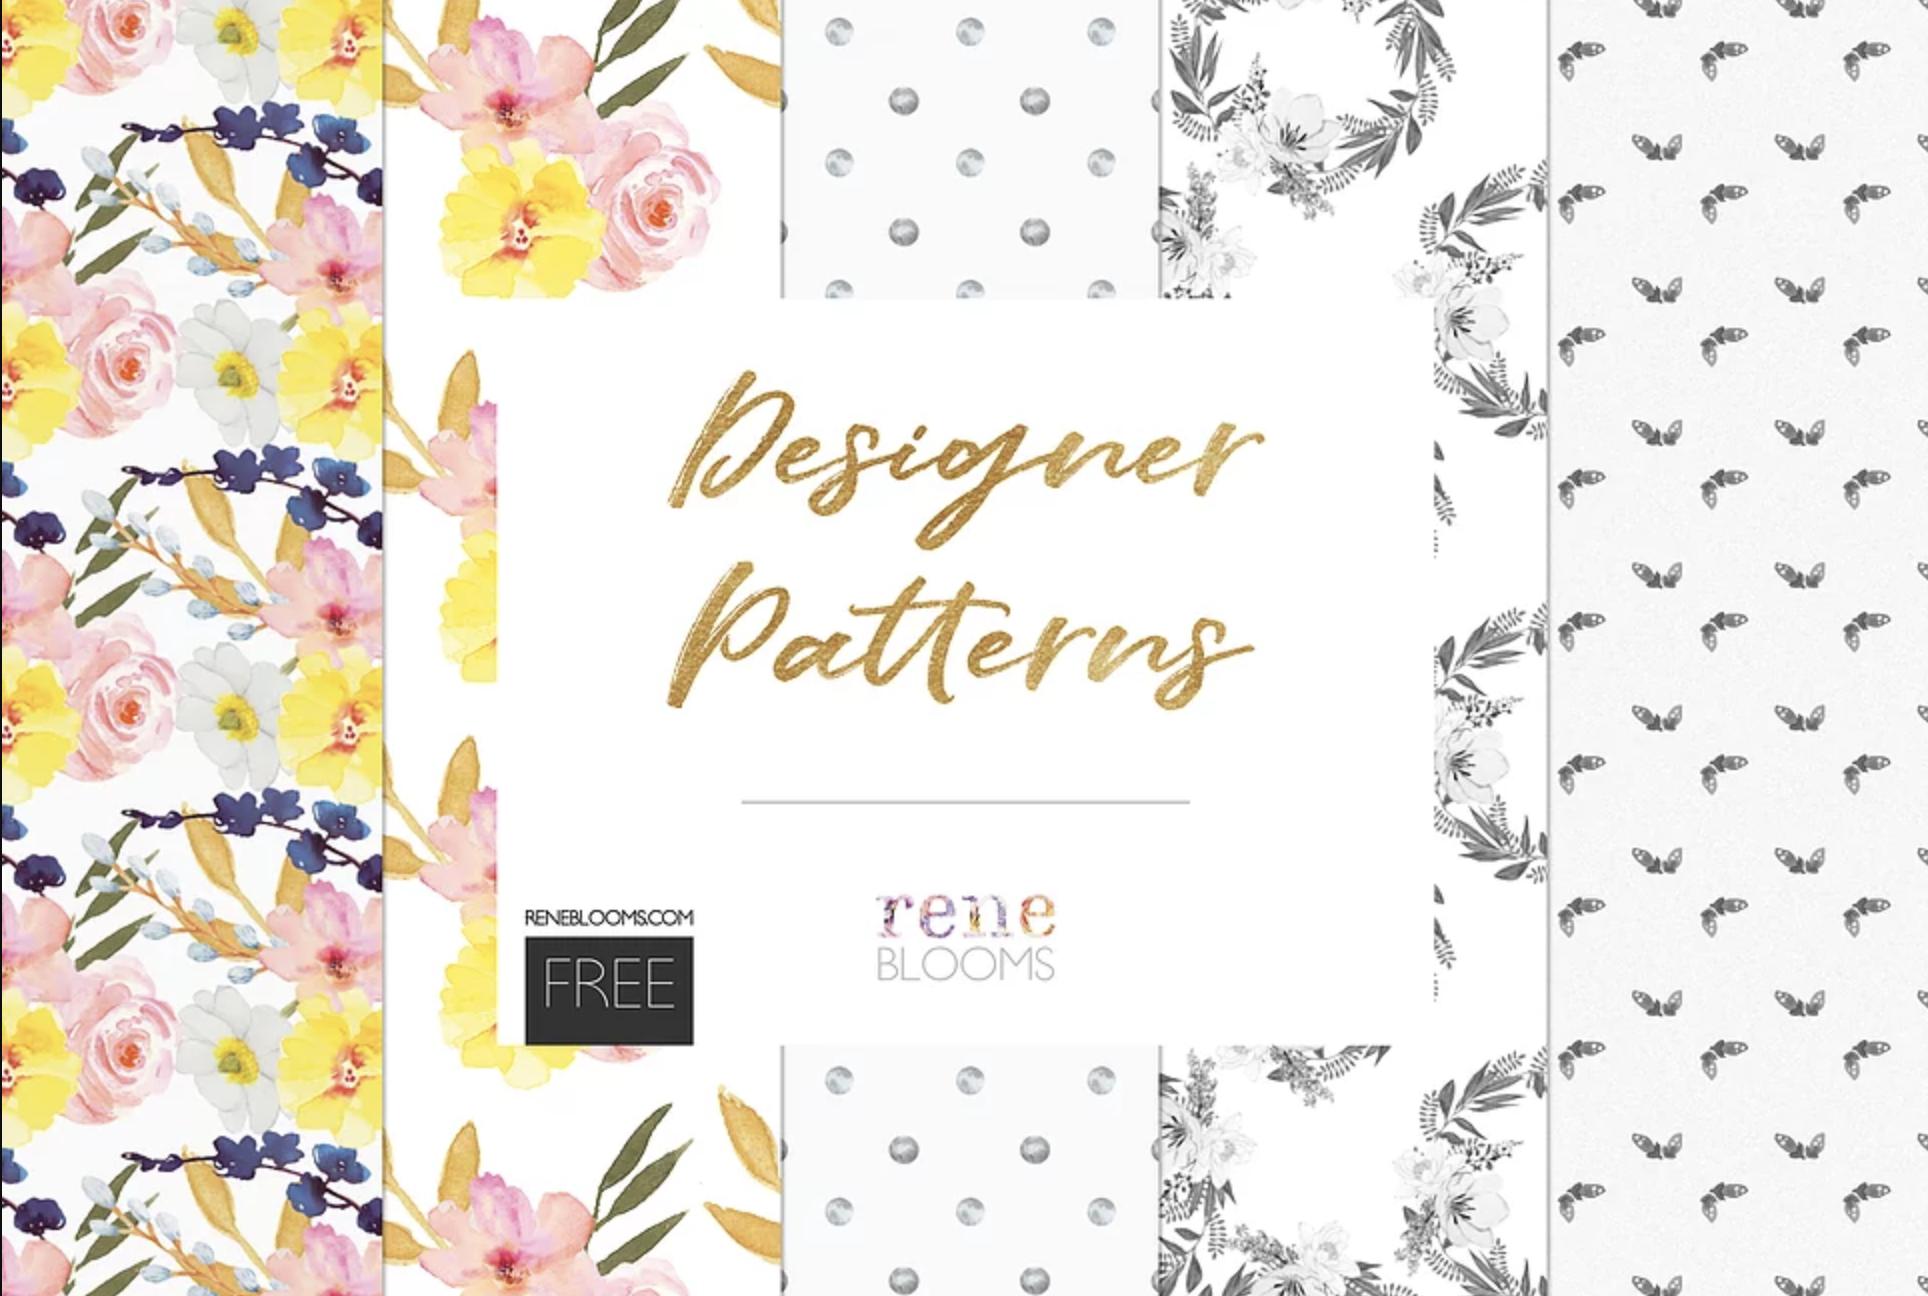 floral designer patterns freebie from rene blooms